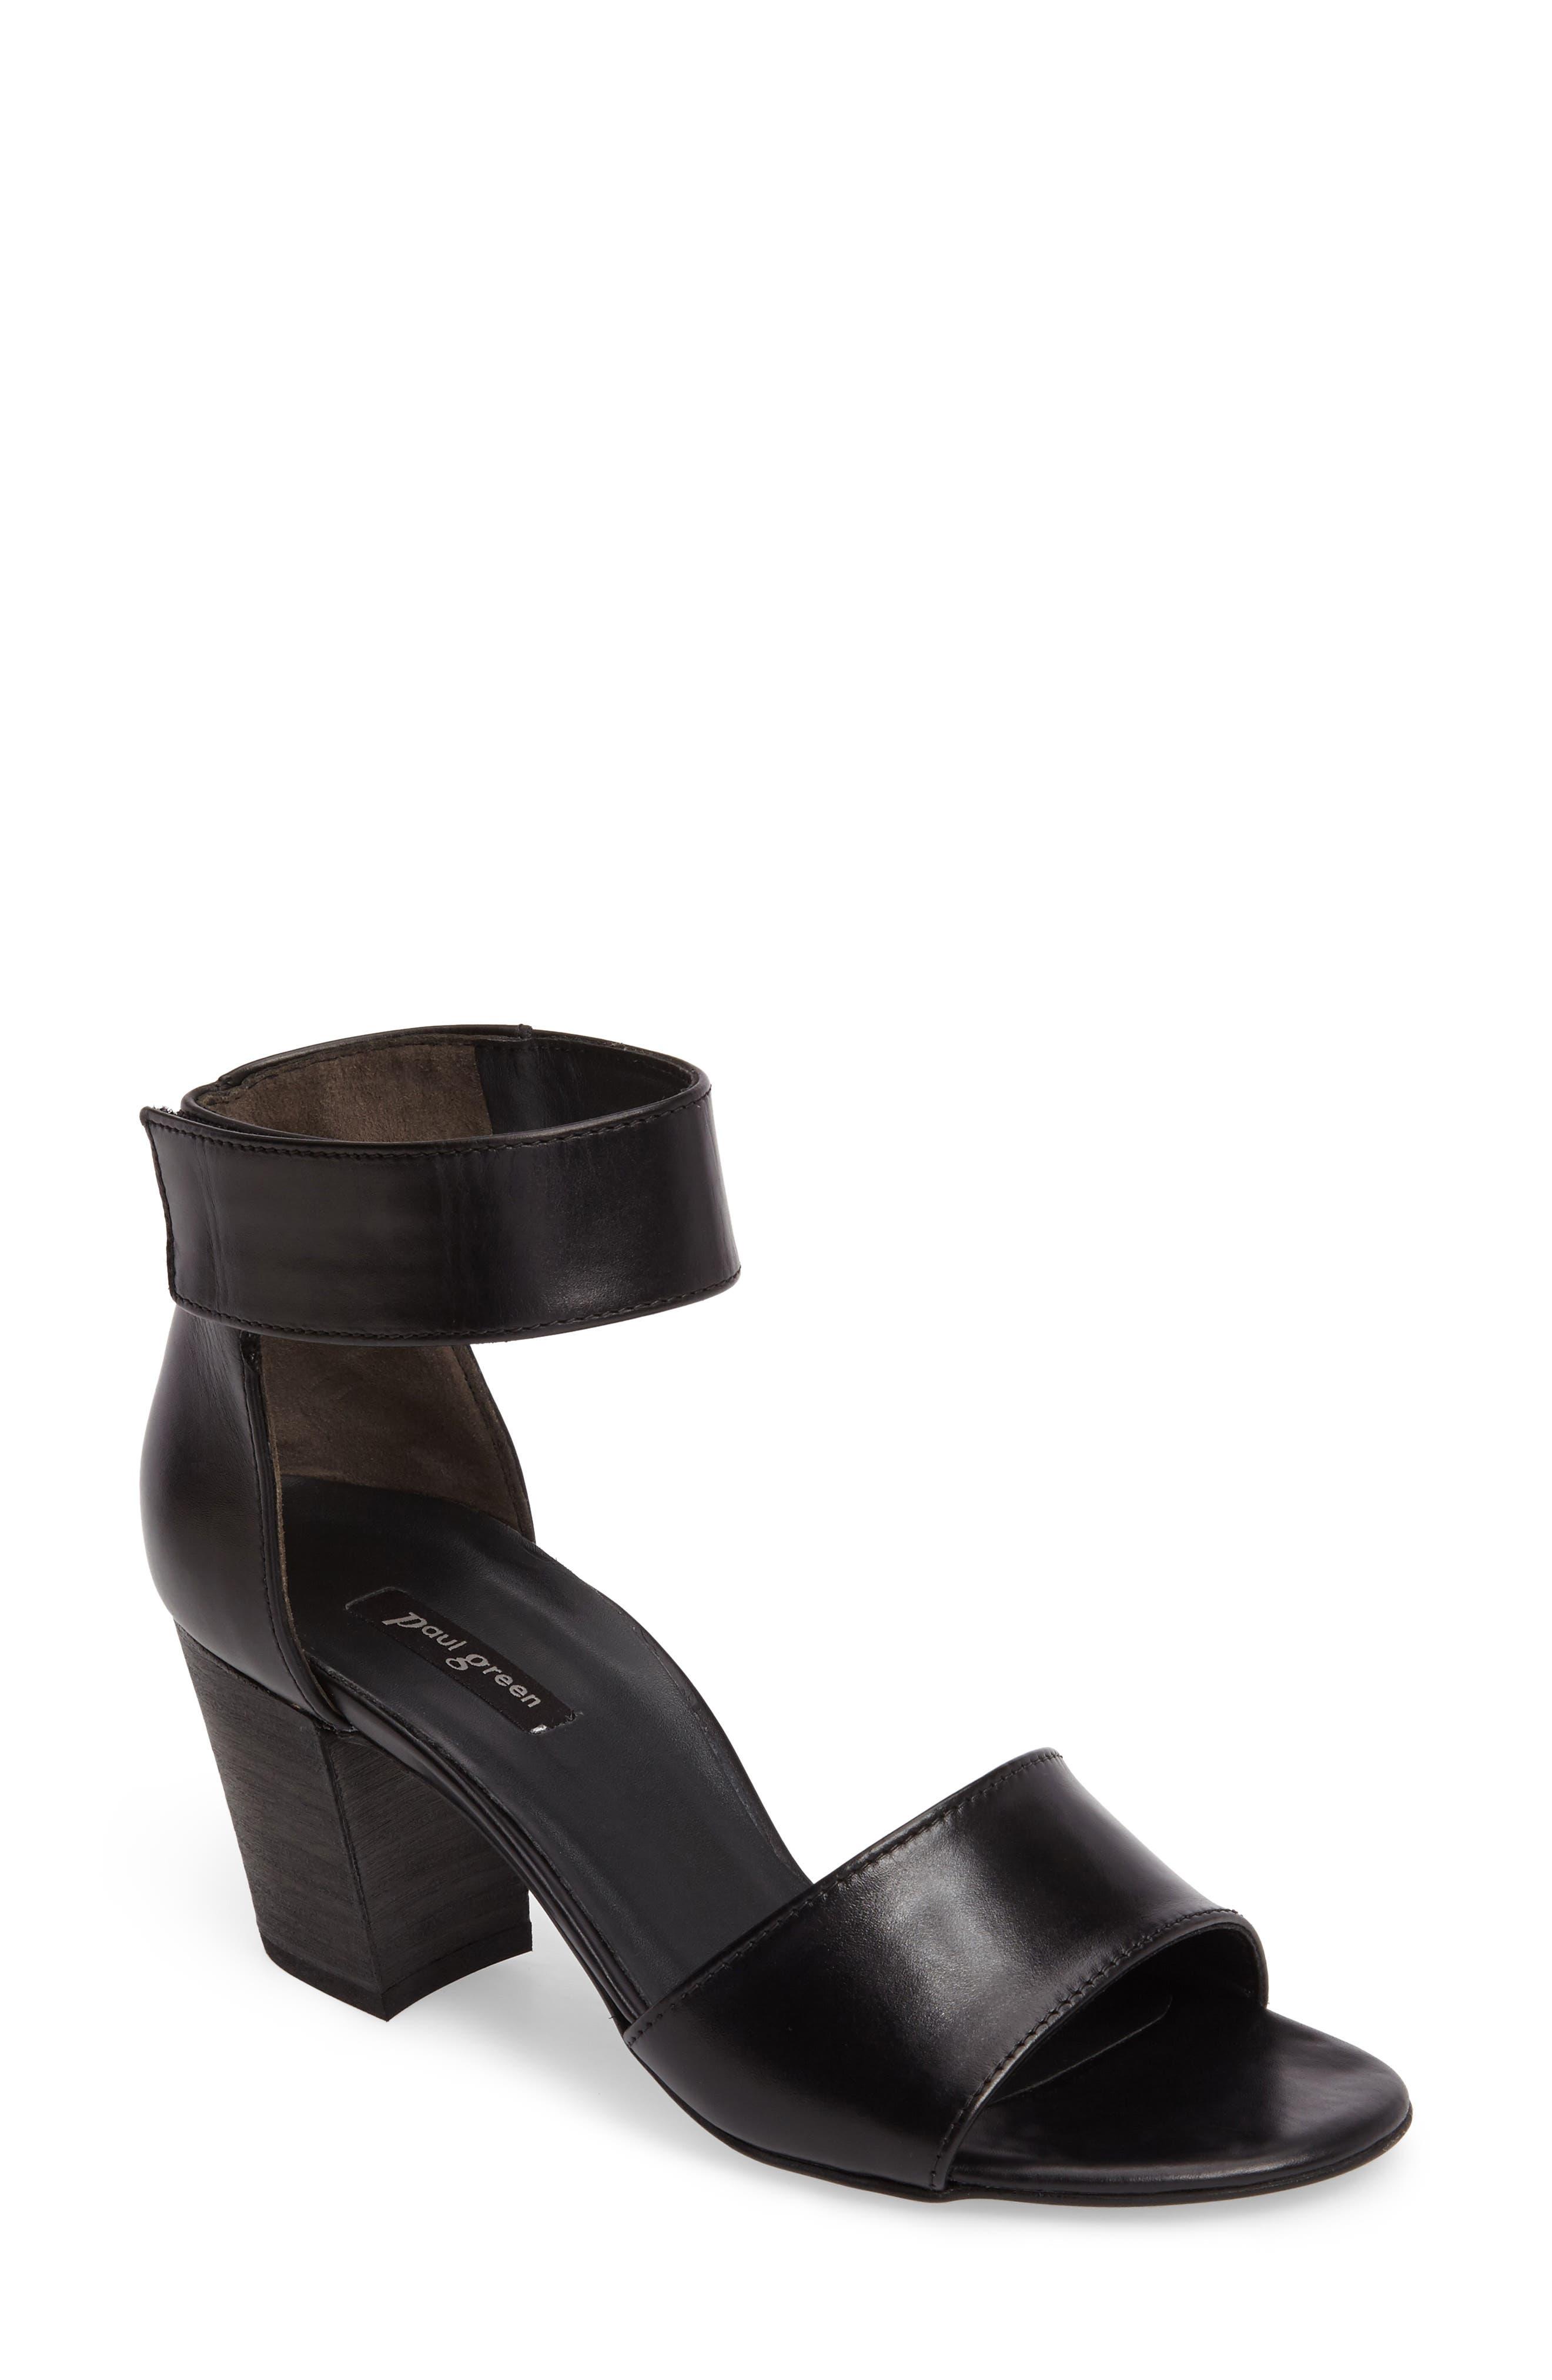 Mackenzie Ankle Strap Sandal, Main, color, 001